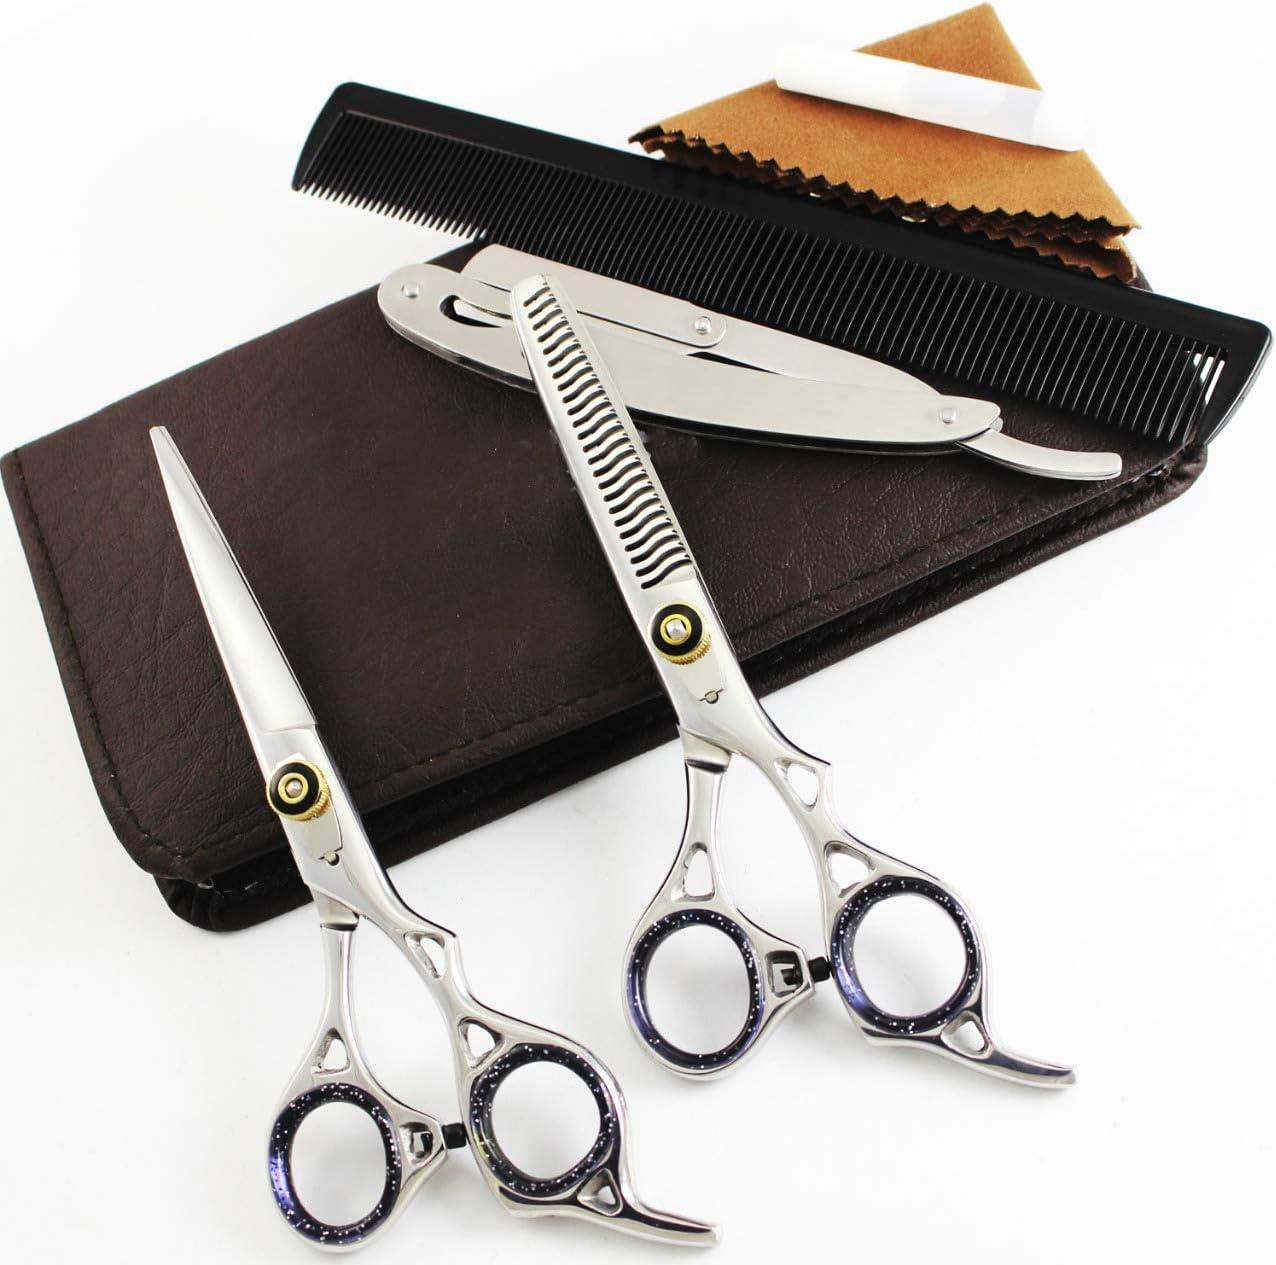 Dearest Professional Wholesale Razors In stock Edge Barber Cutting Hair She Scissor